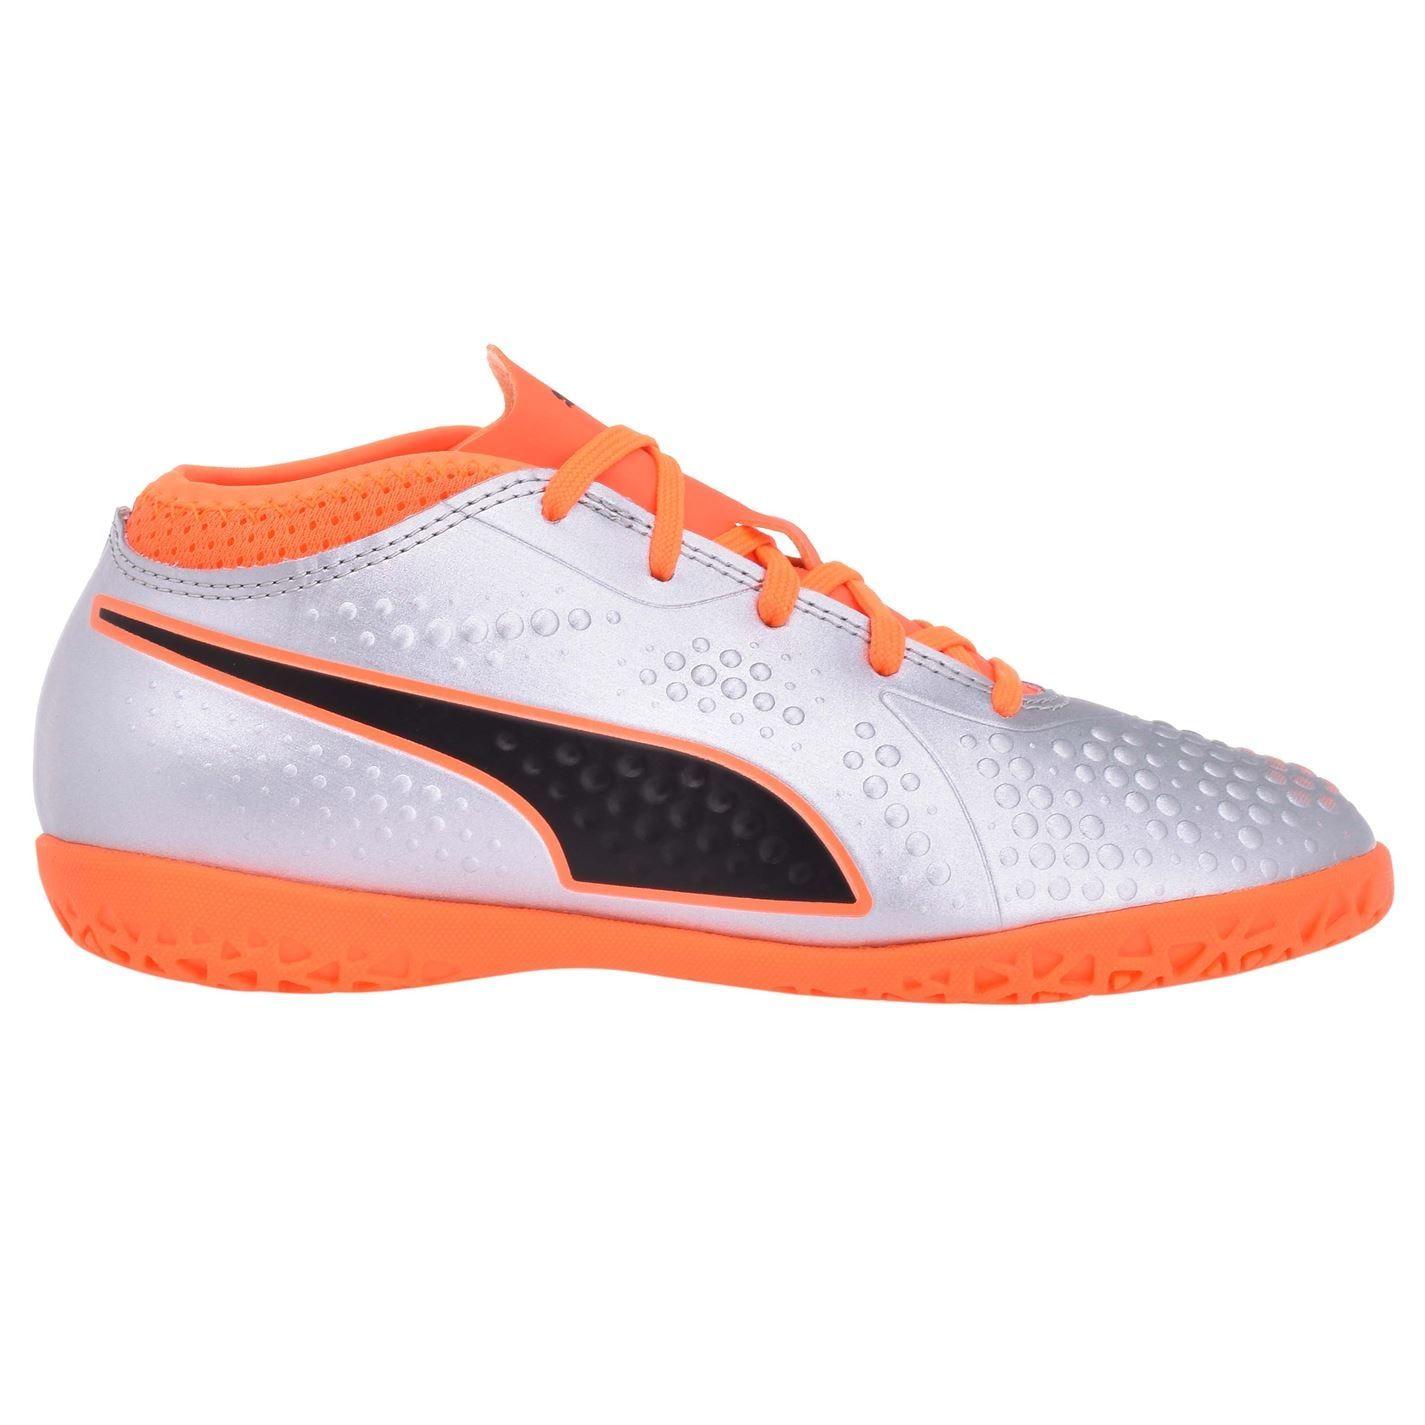 heroína brumoso Desafío  Puma ONE 4 Juniors Indoor Futsal Football Boots Boys Silver/Orange Soccer |  eBay